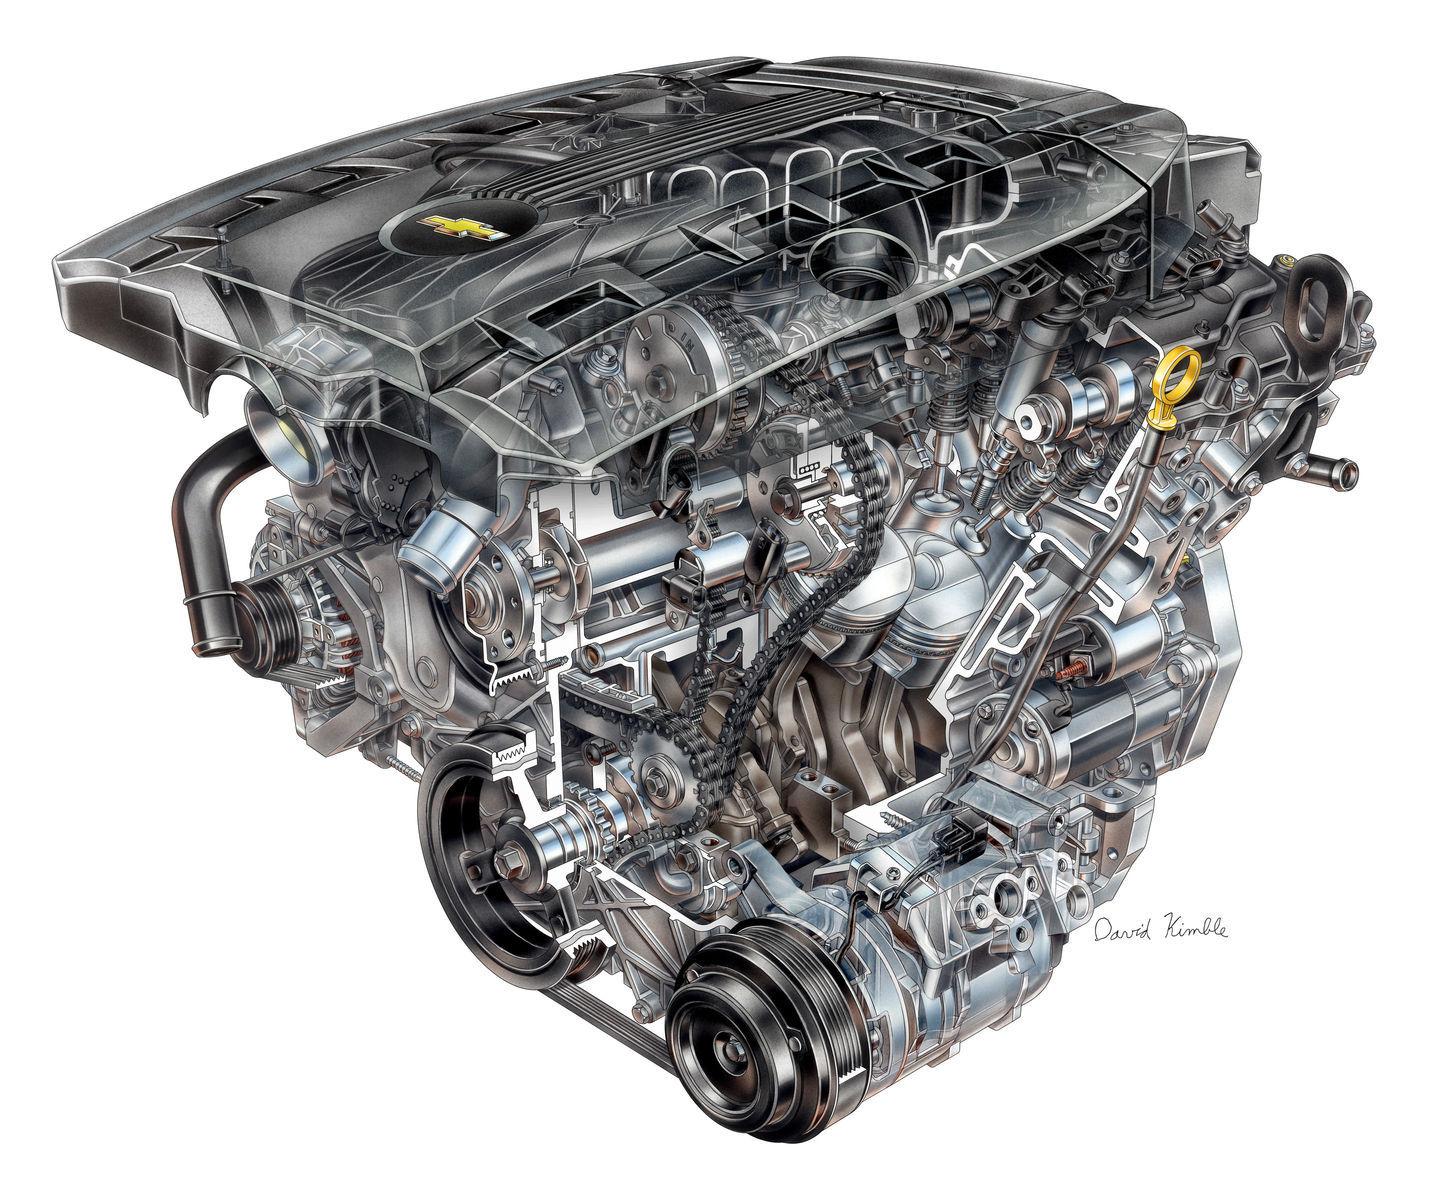 2012 Chevrolet Camaro | LFX